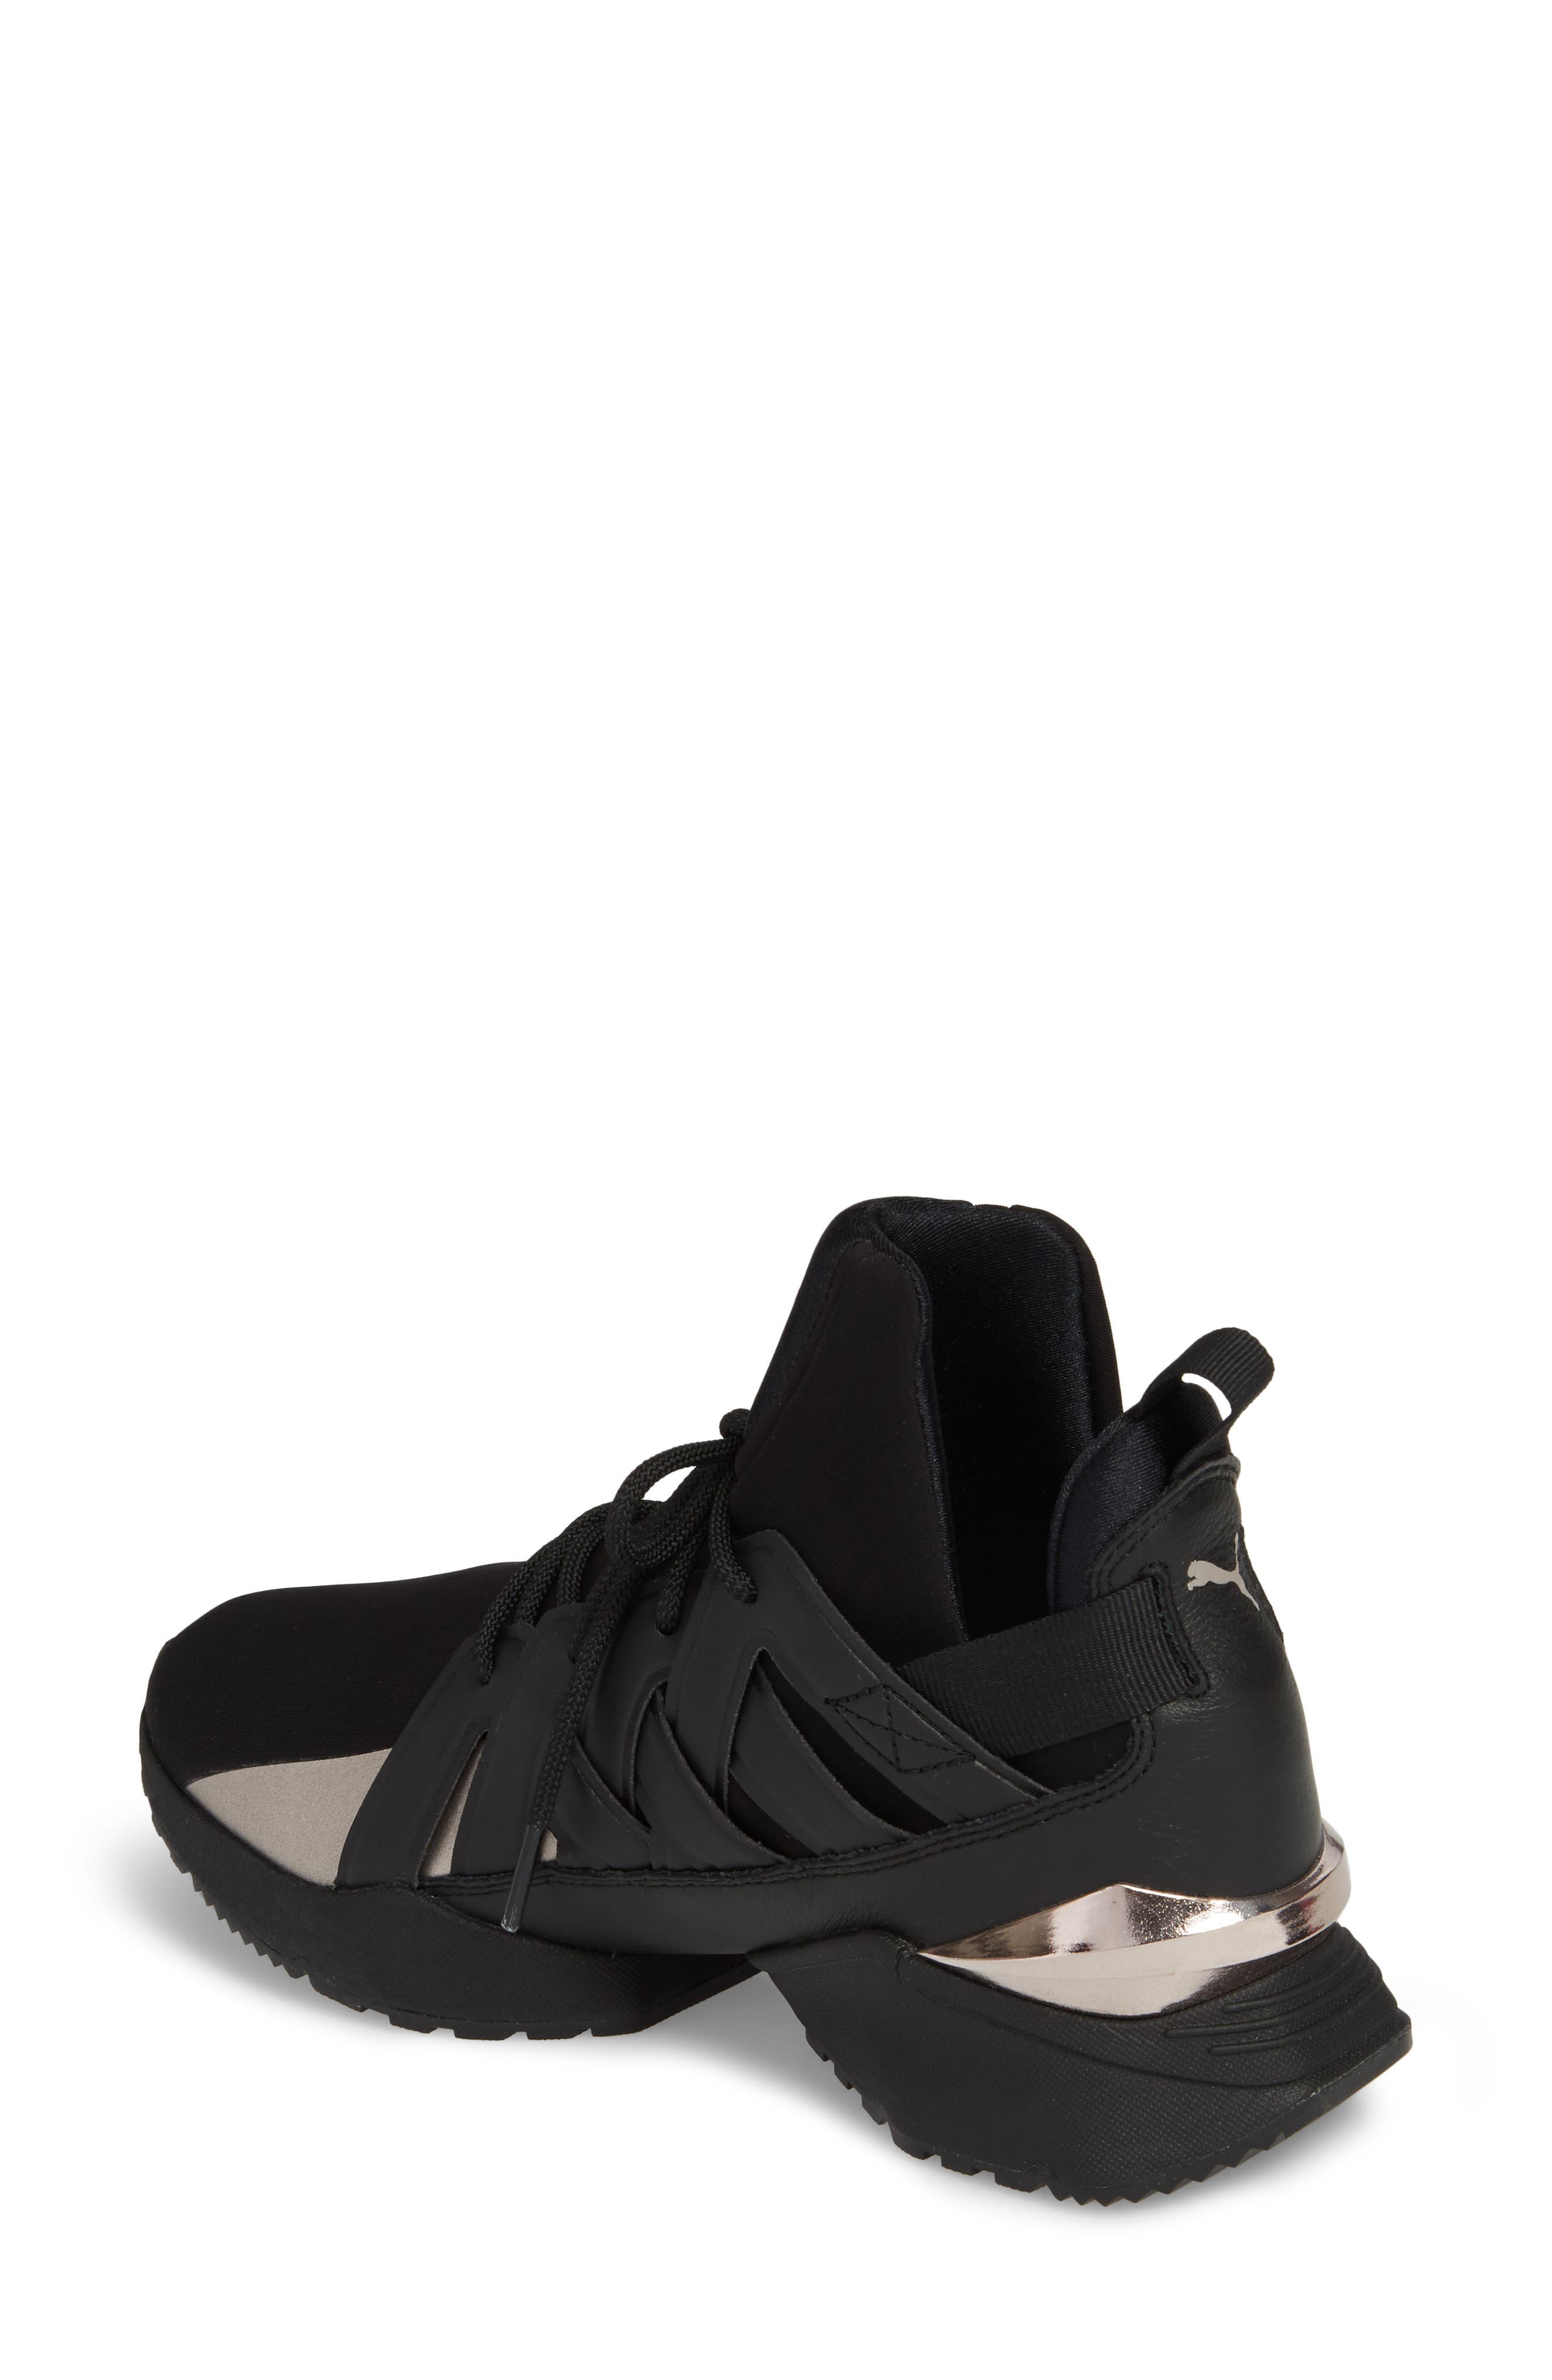 Muse Echo Sneaker,                             Alternate thumbnail 2, color,                             Puma Black